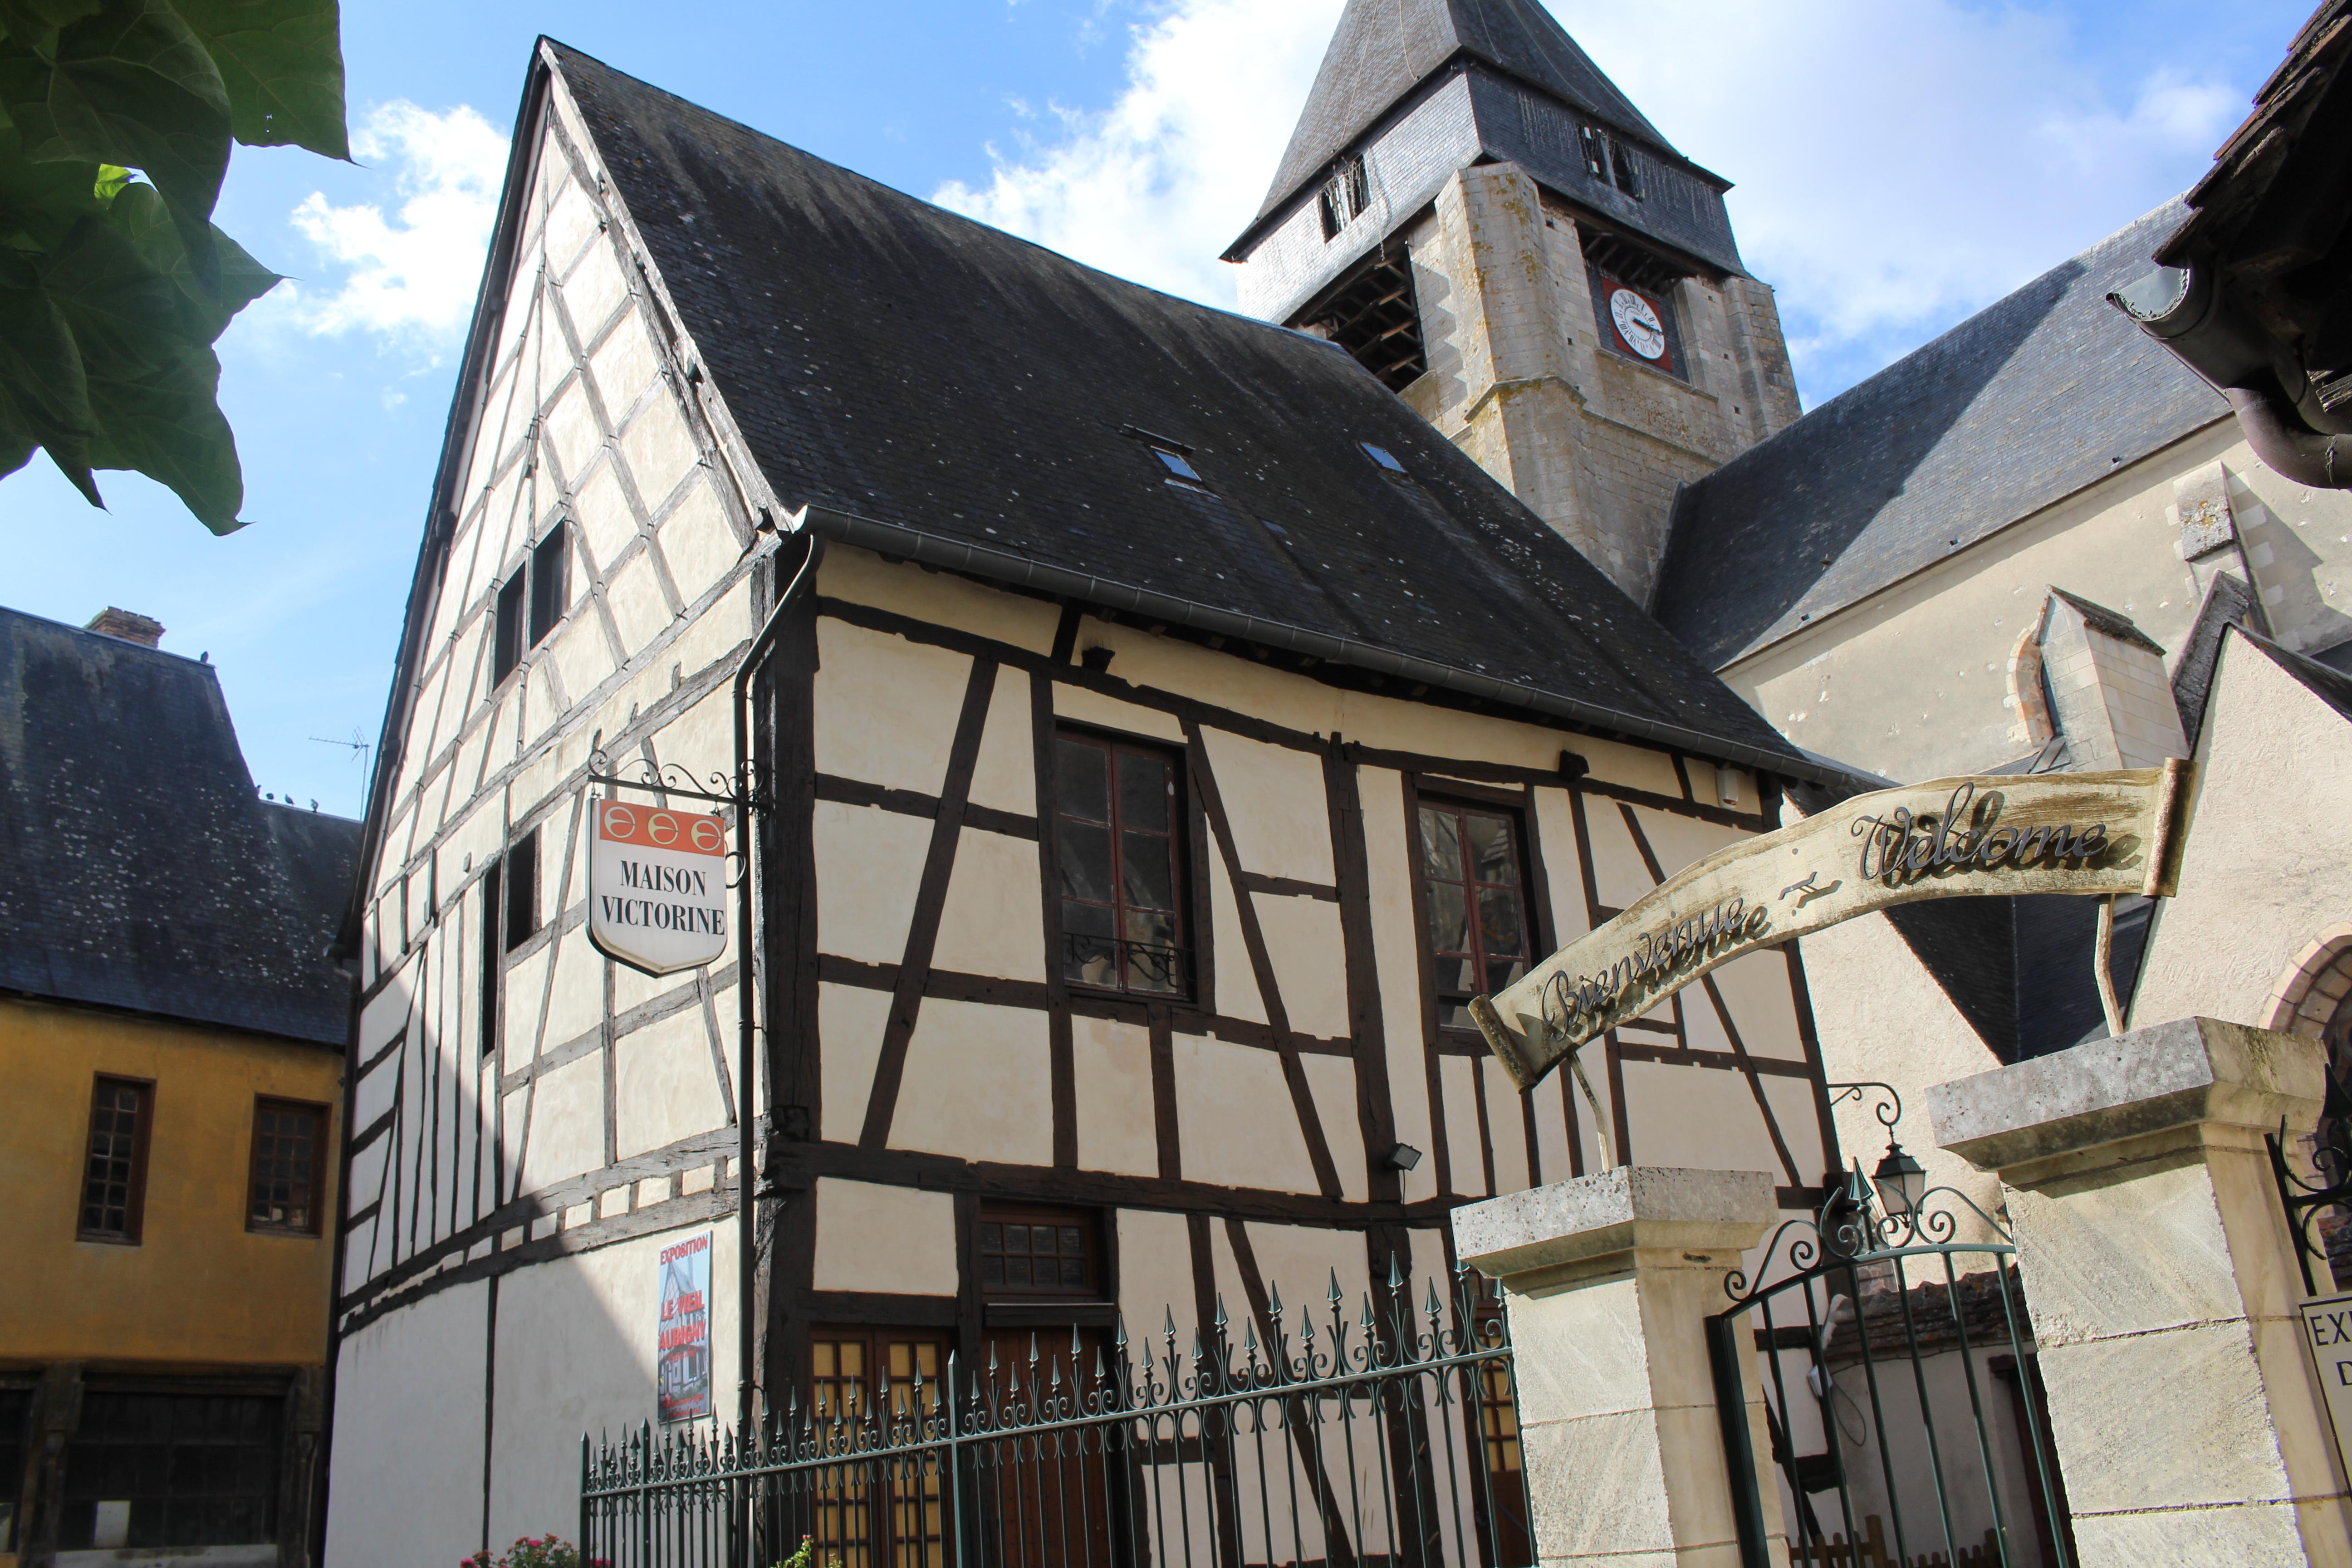 Maison Victorine